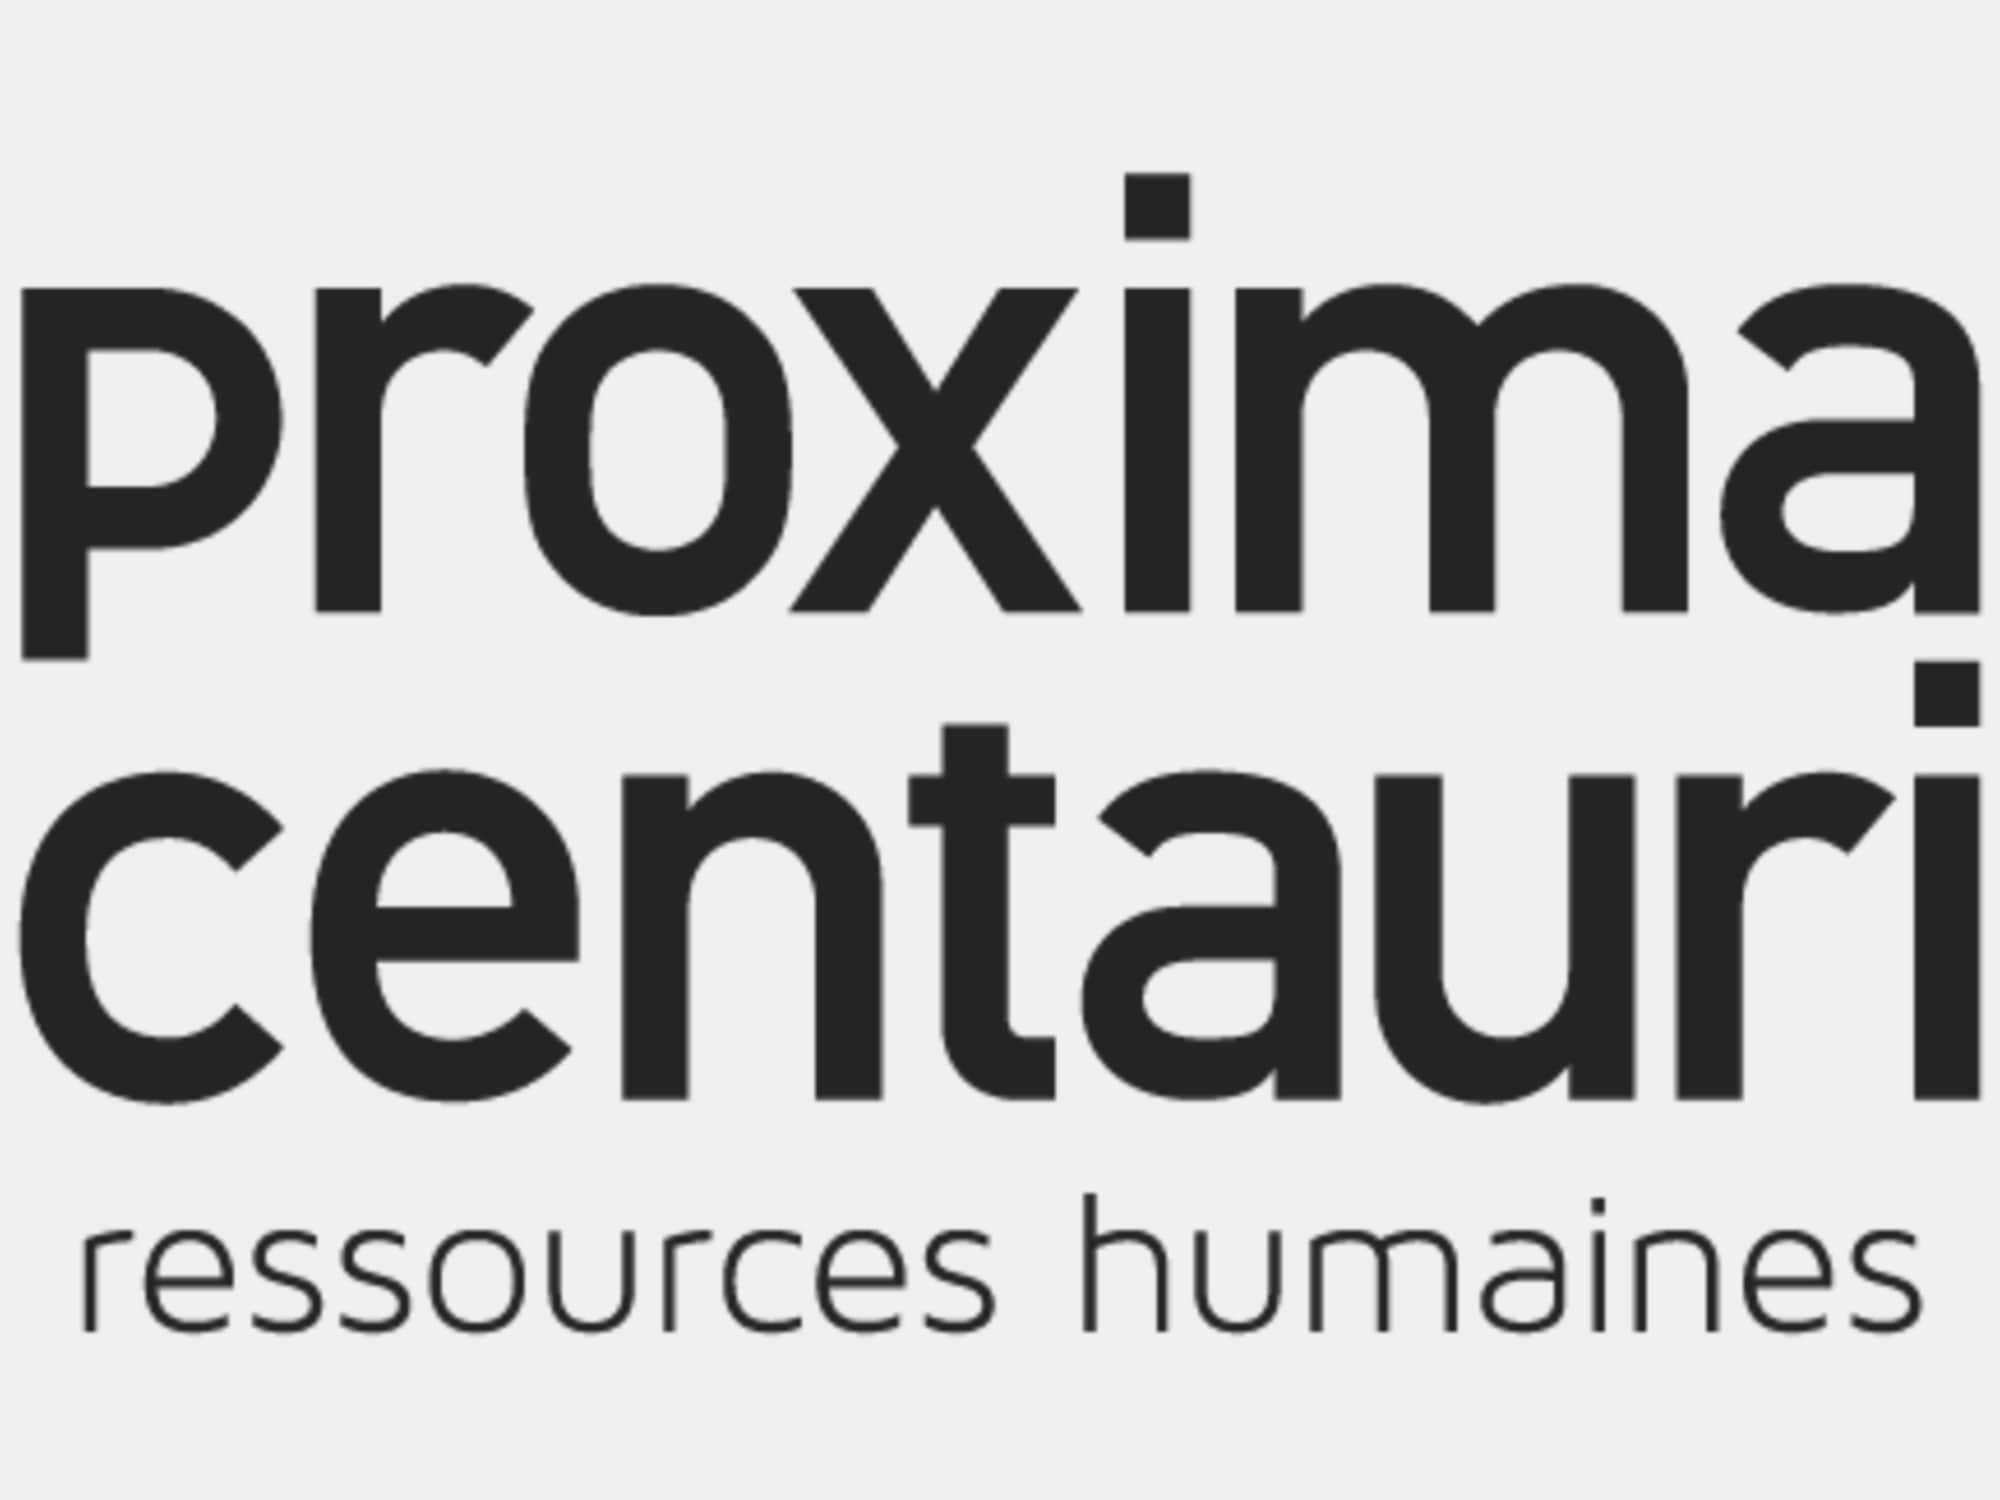 Proxima Centauri.jpg